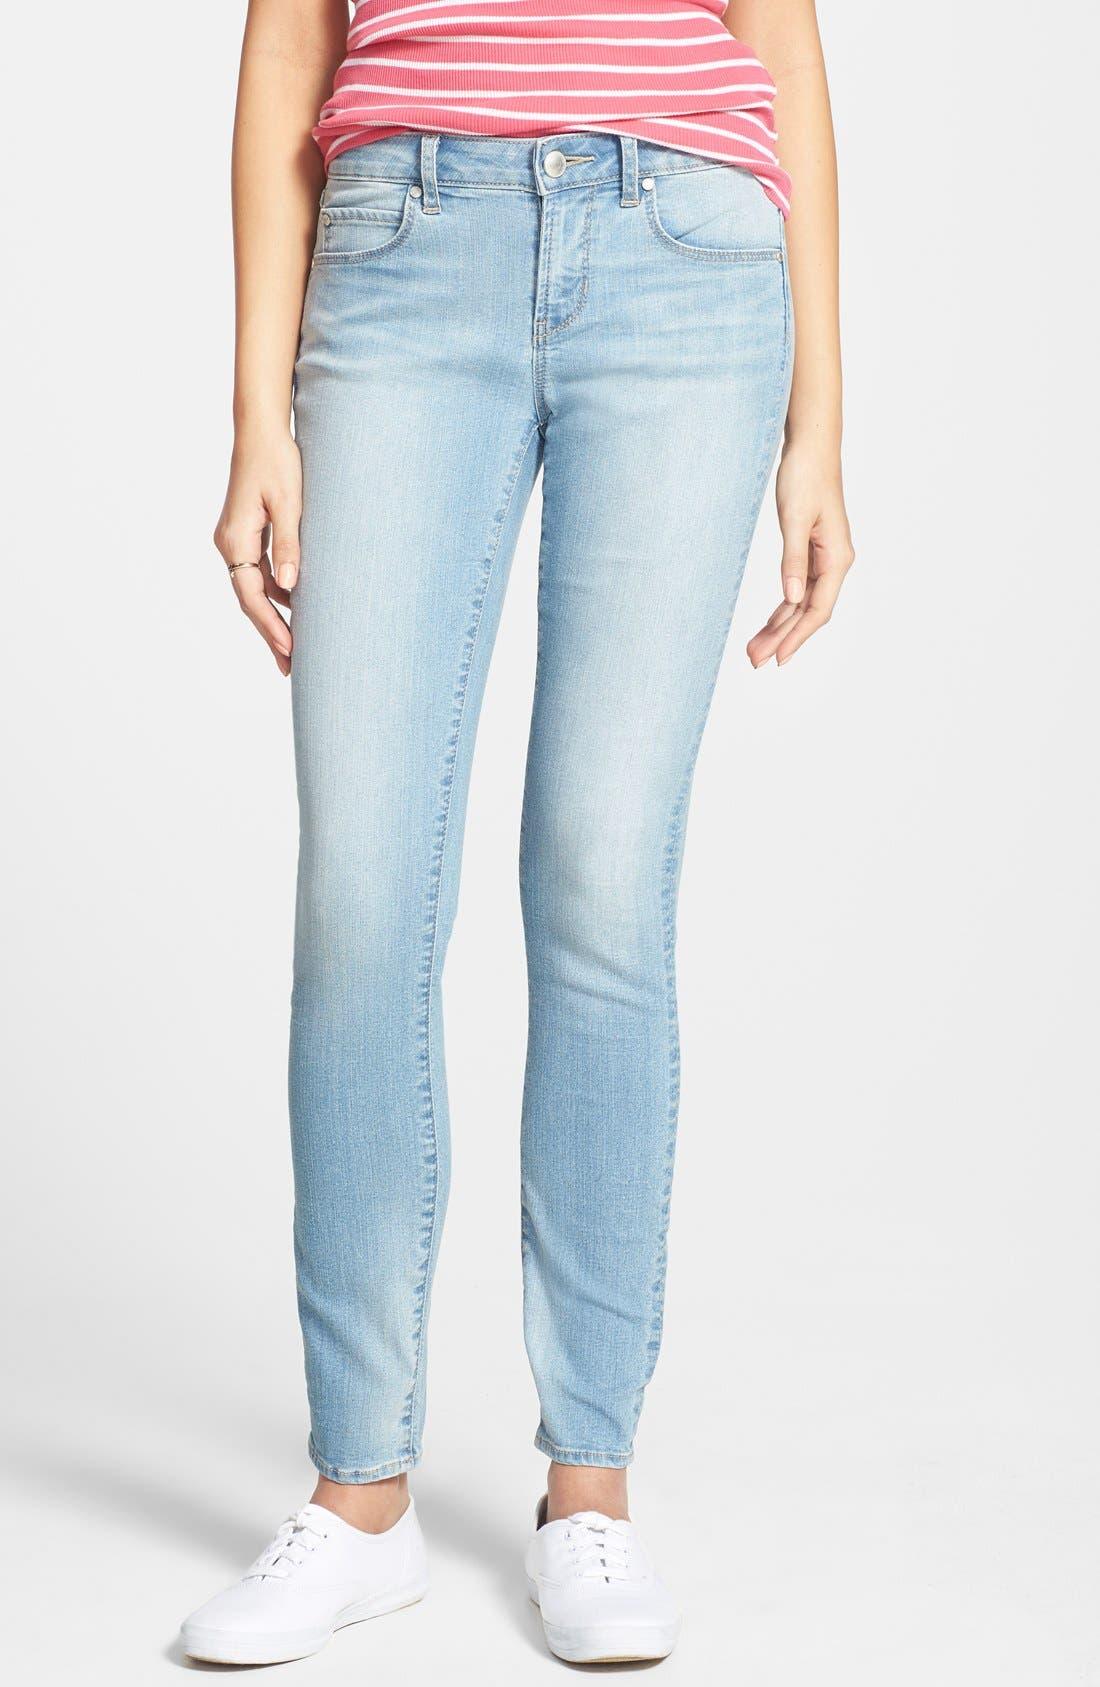 Main Image - Articles of Society 'Sarah' Skinny Jeans (Light)